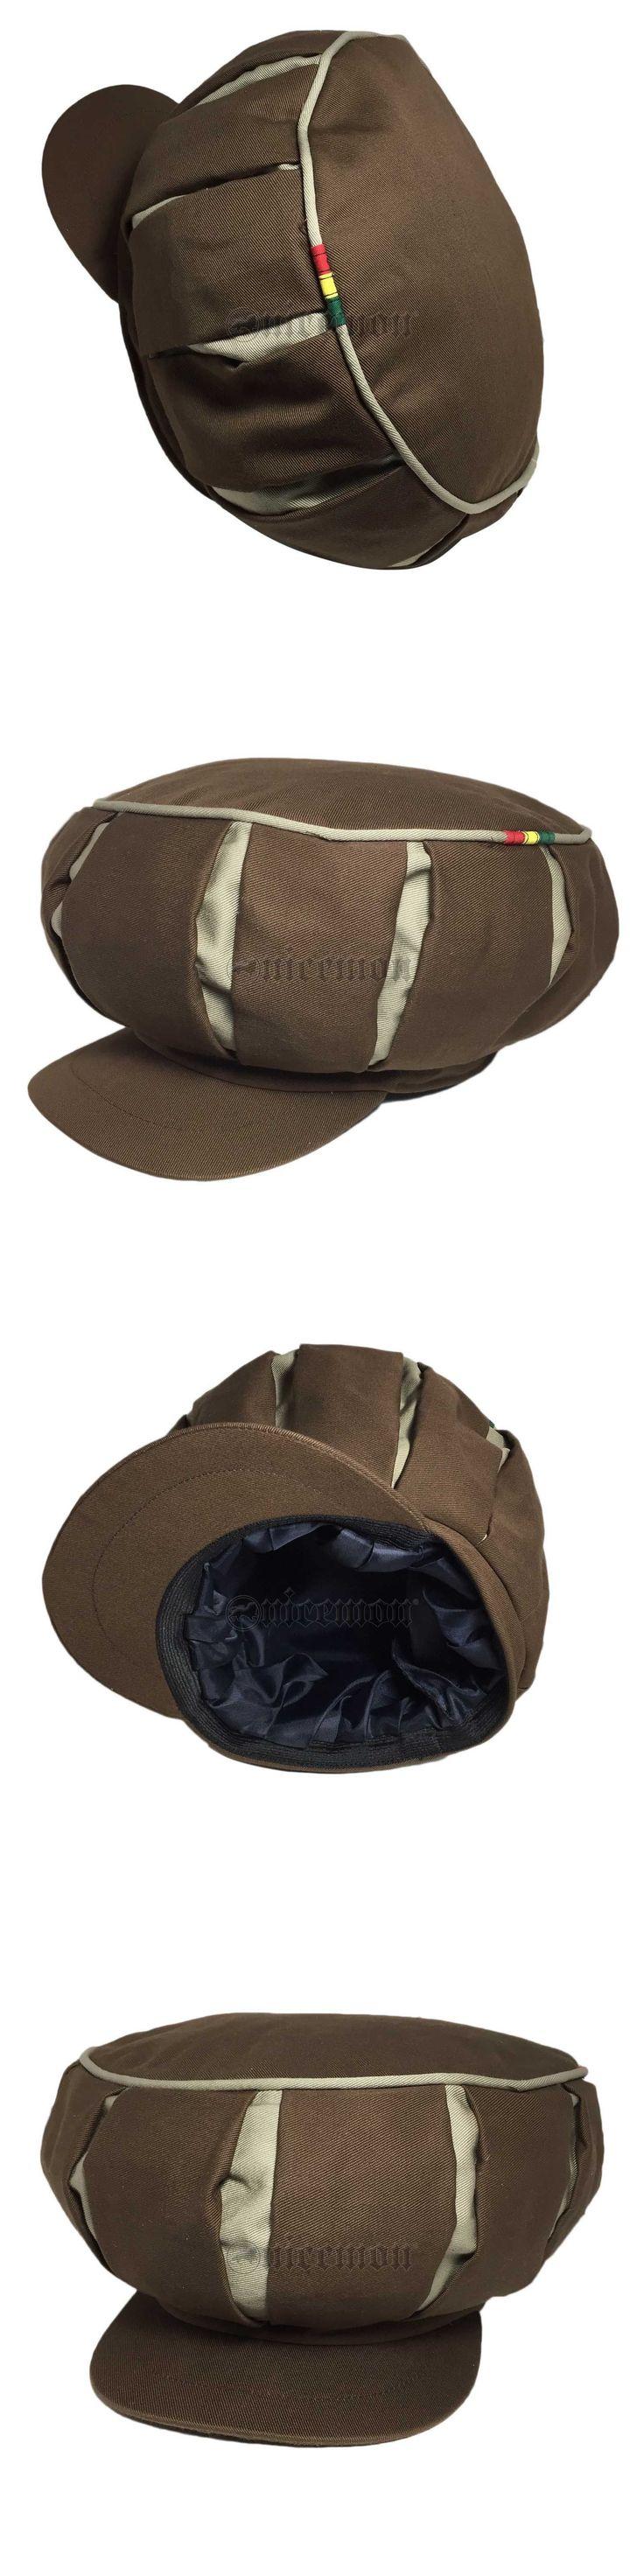 Hats 163543: Rasta Hat Cap Selassie Africa Rastafari Dubwise Reggae Jamaica Negus Marley L Xl -> BUY IT NOW ONLY: $64.99 on eBay!